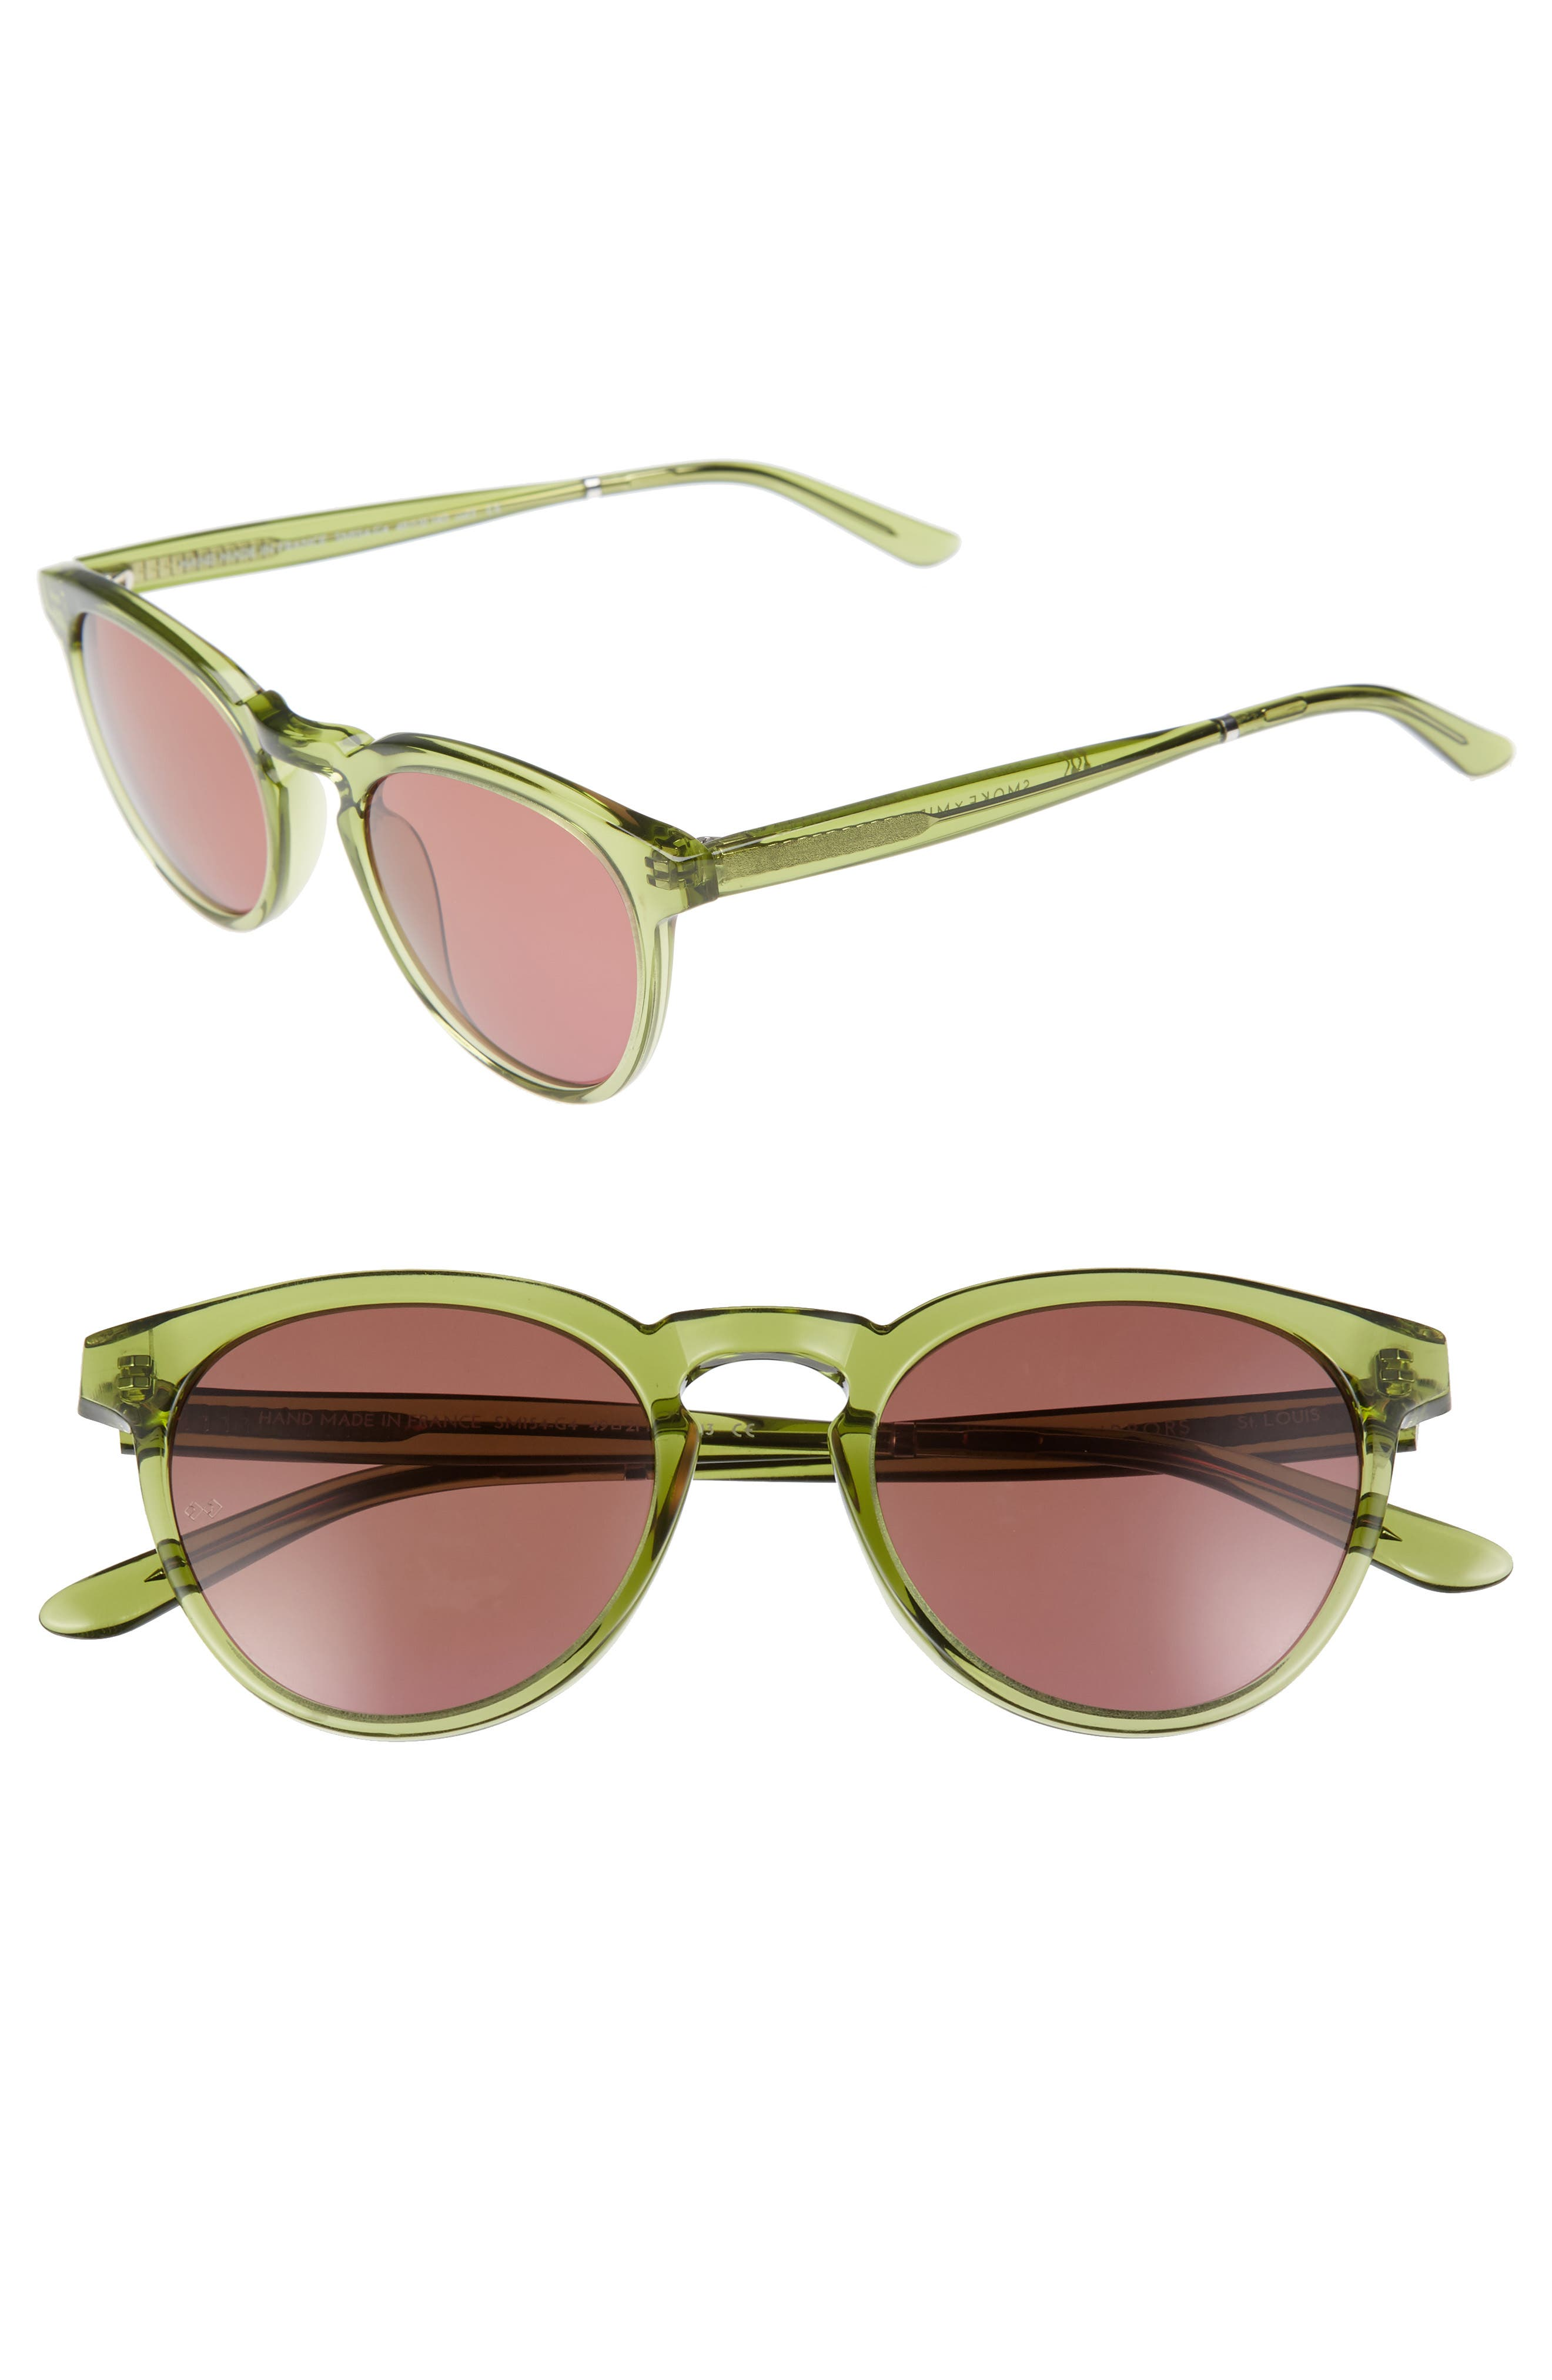 SMOKE X MIRRORS St. Louis 49mm Retro Sunglasses